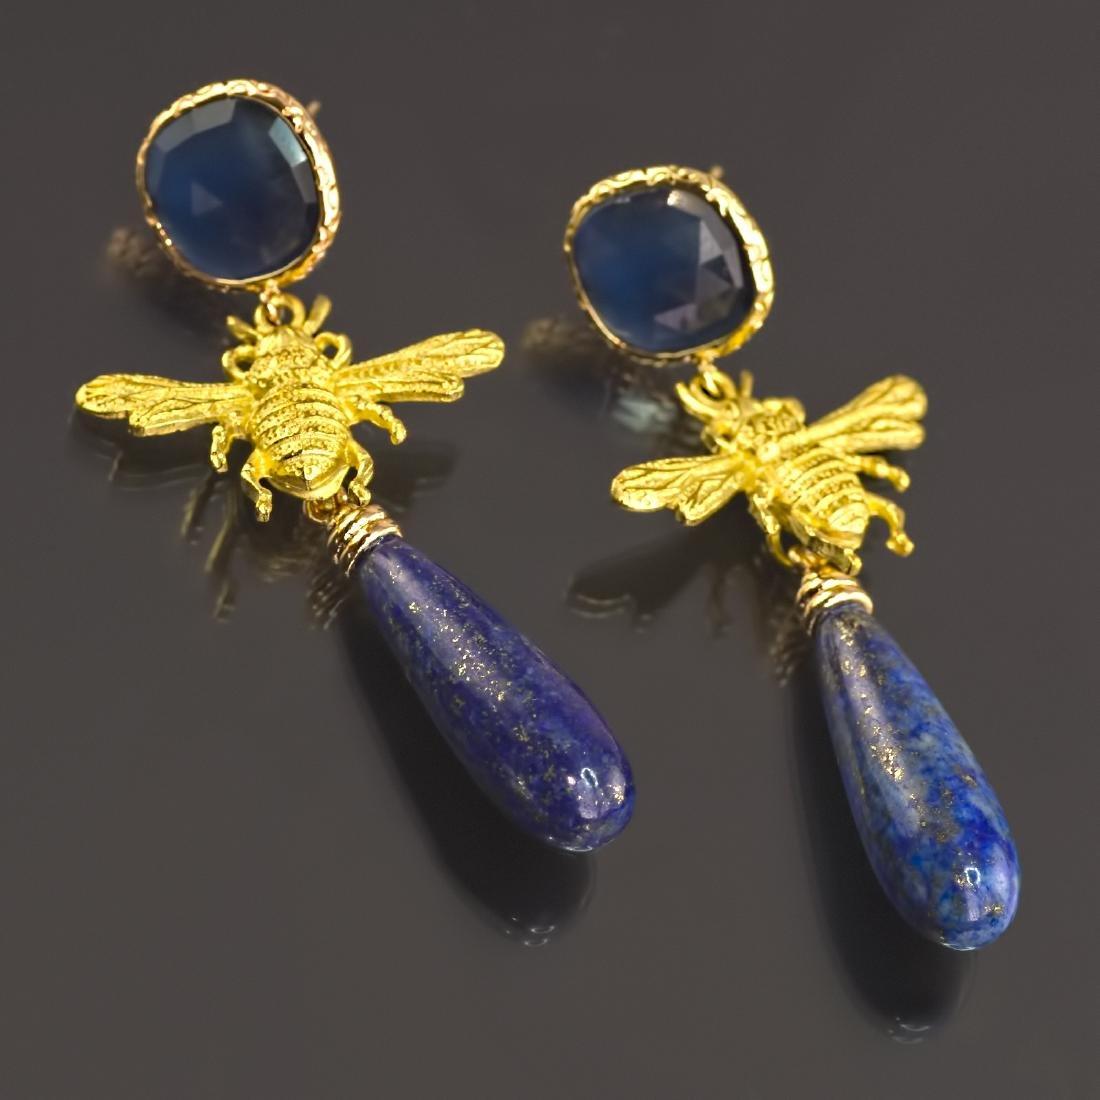 Lapis lazuli Fly Eye-catching Earrings - 2